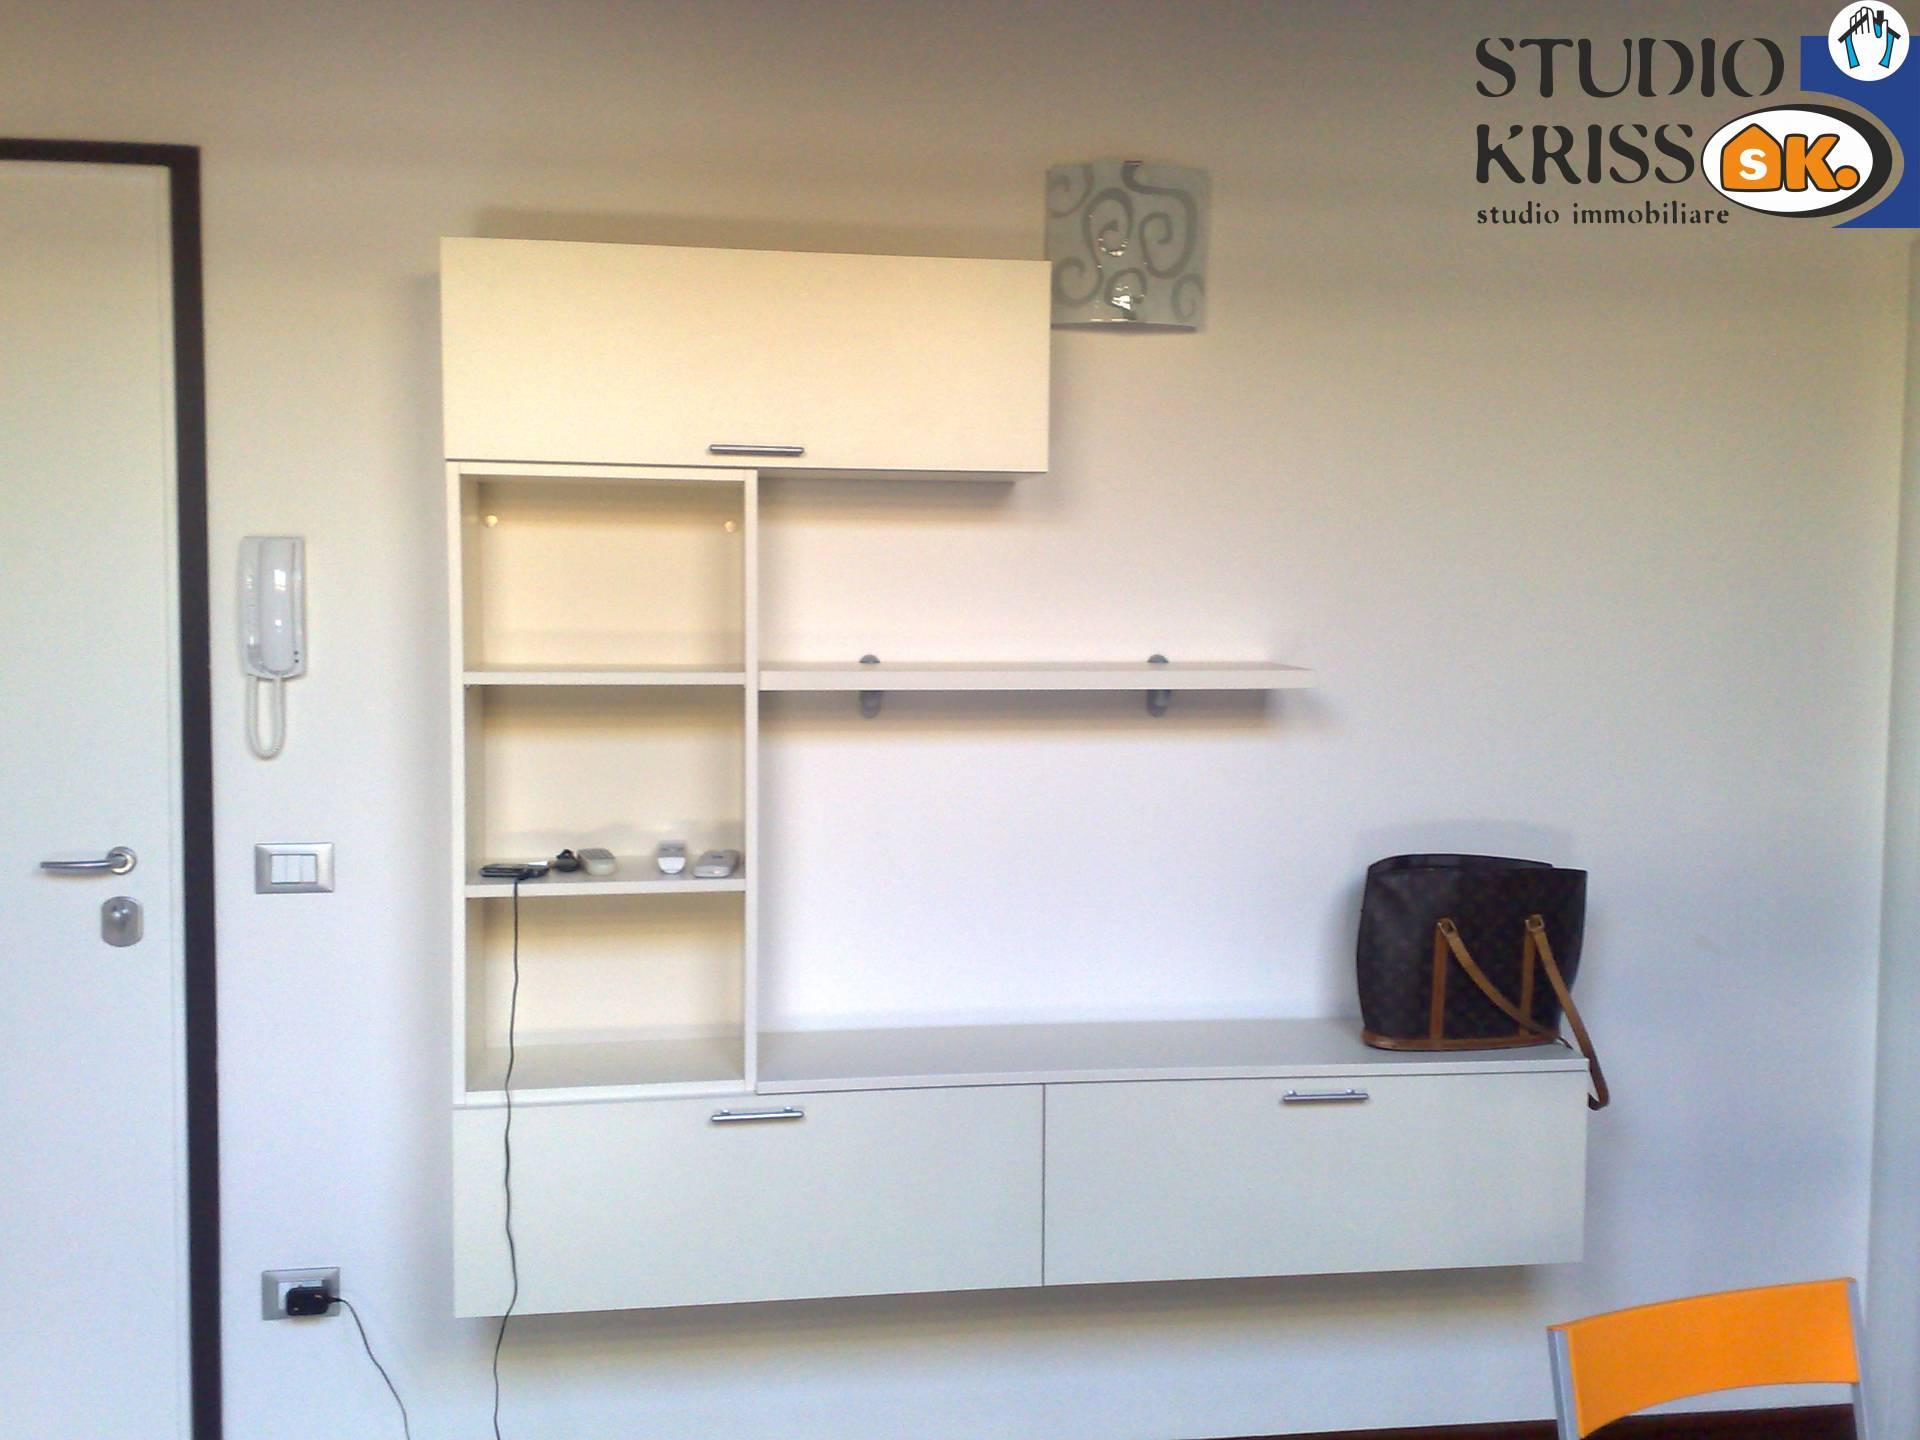 Appartamento in Vendita a Ferrara: 2 locali, 60 mq - Foto 4